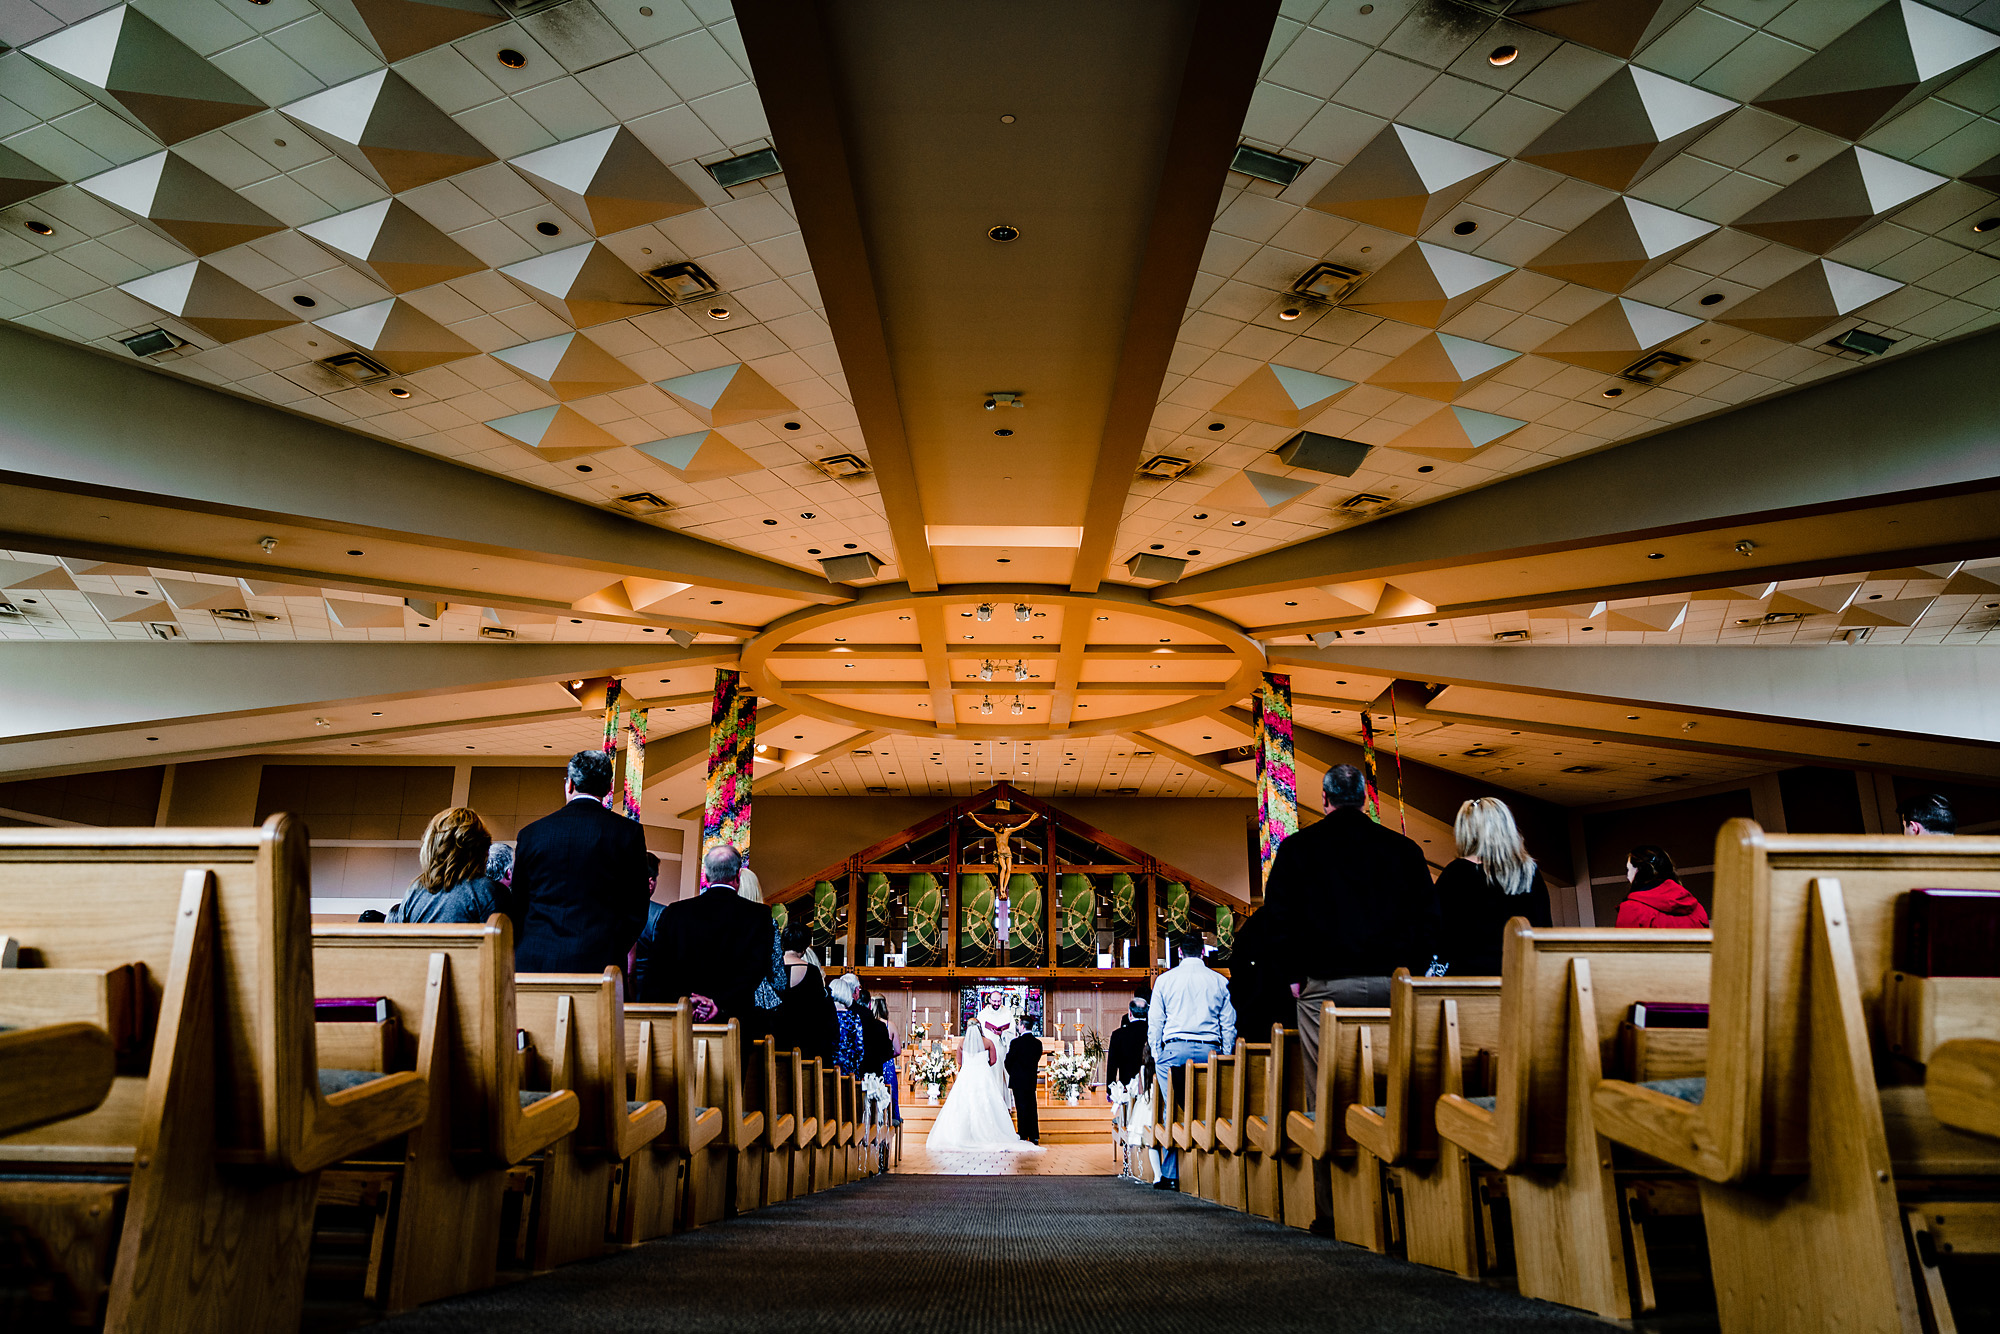 St-Susanna-Church-Mason-OH-Wedding-Photographer-12.jpg